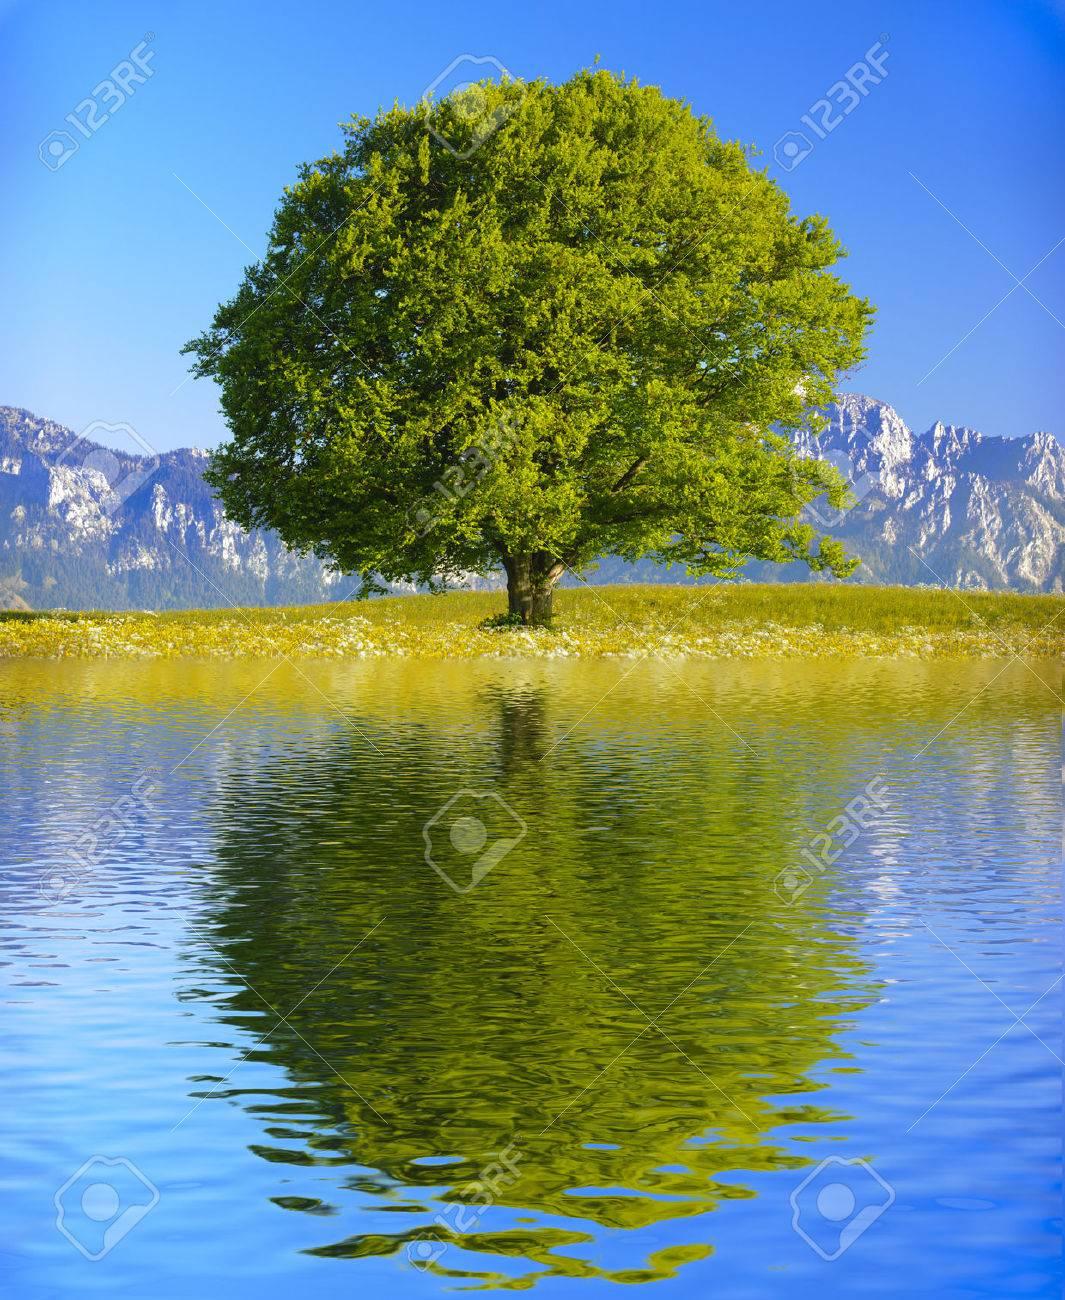 single big old tree mirroring on water surface - 36471071